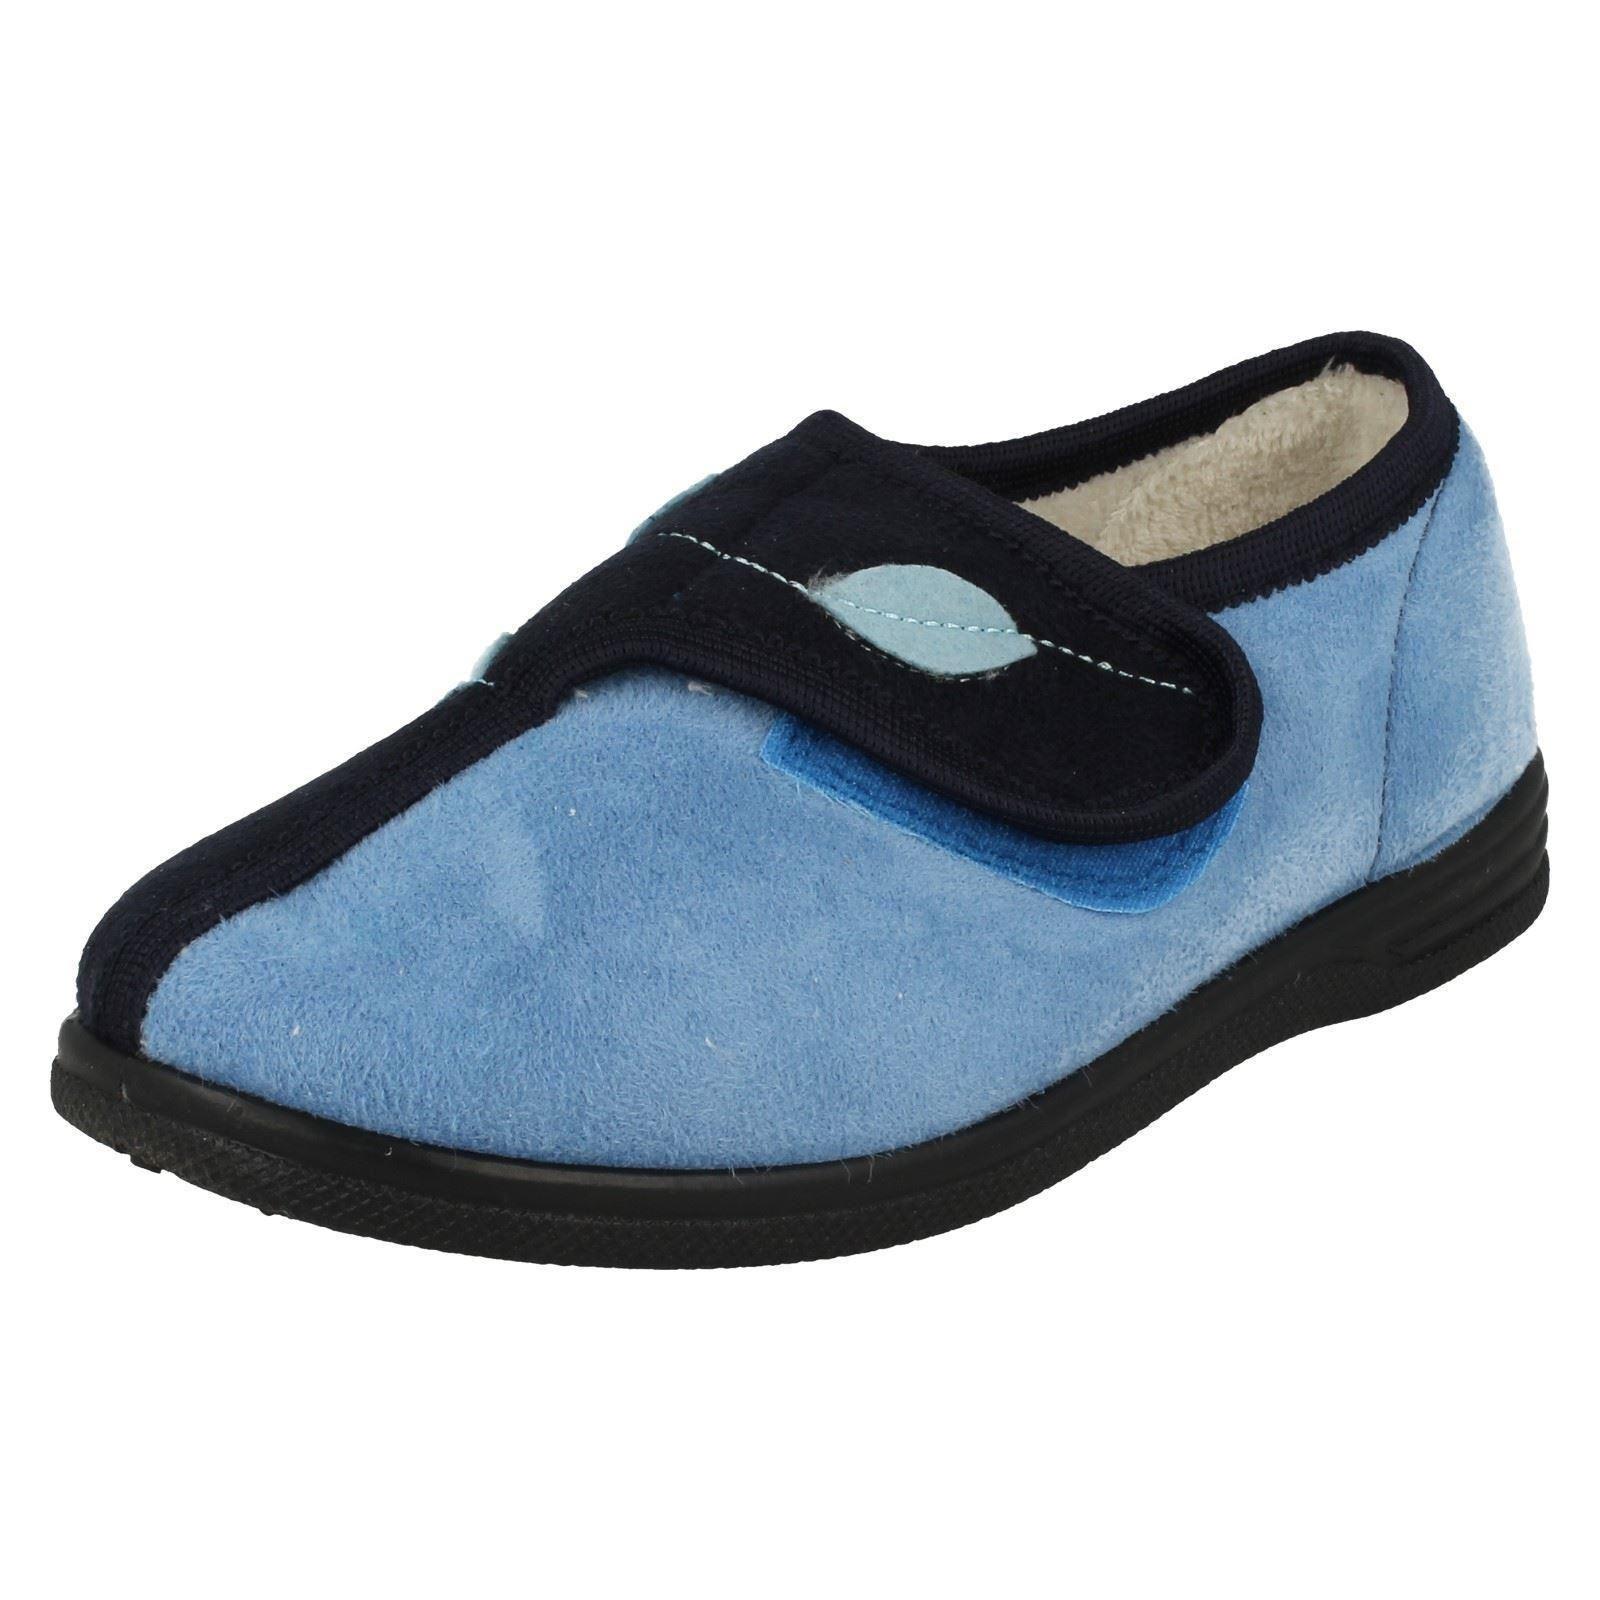 Mujer REBAJAS Sandpiper Textil Azul Marino/Azul Textil Sandpiper Zapatillas Ilene c0272f